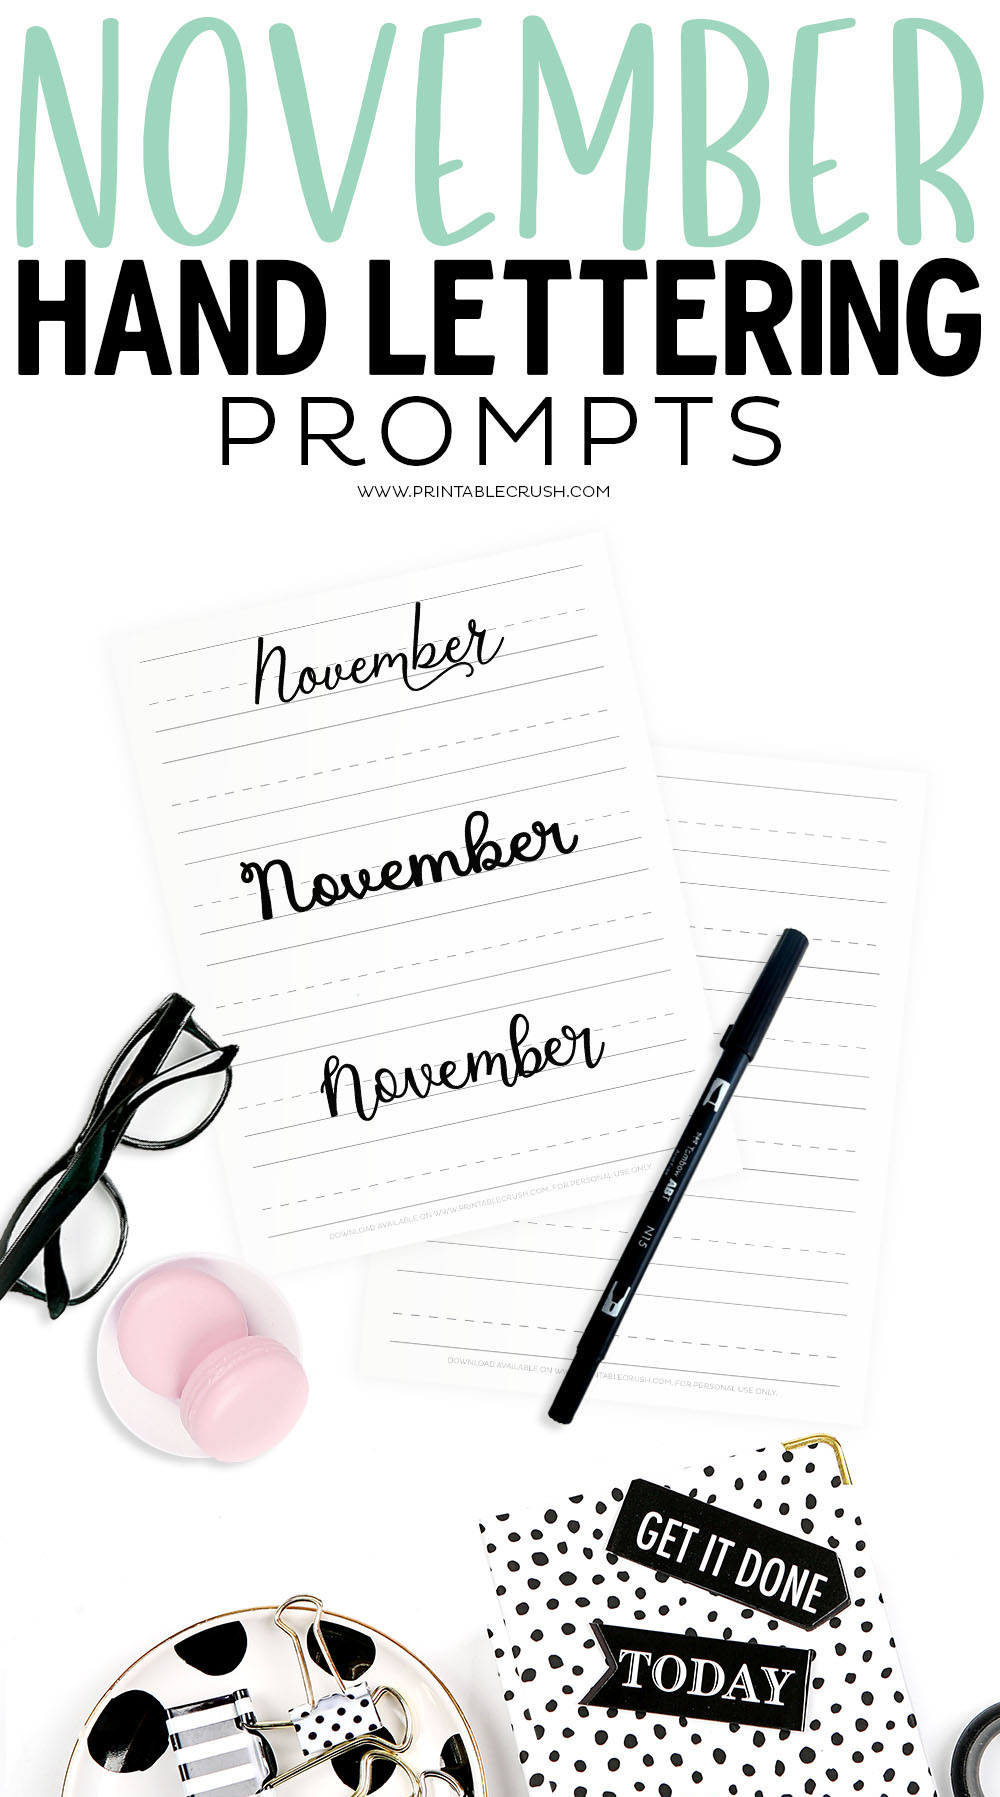 Get 30 FREE November Prompts for Hand Lettering!